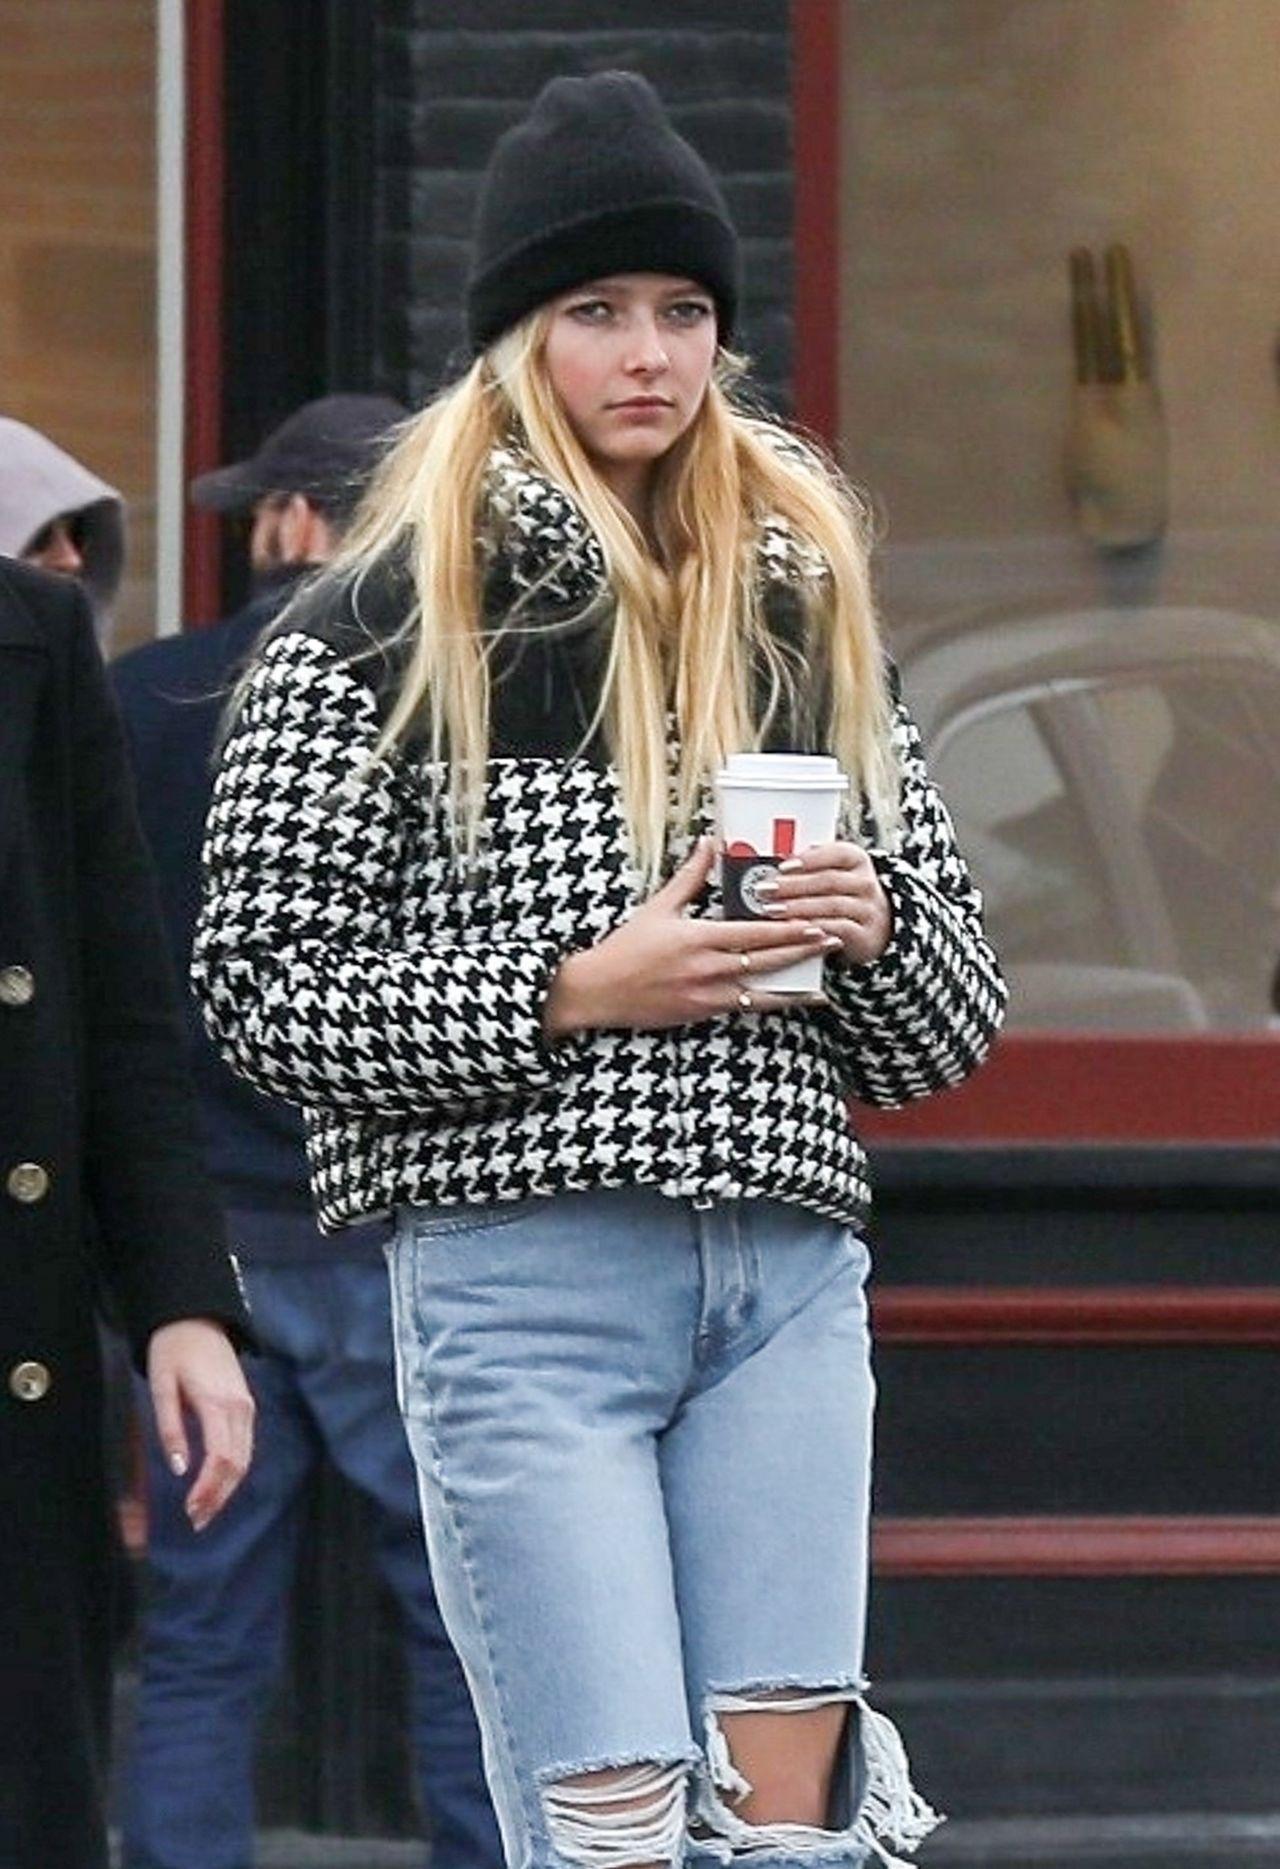 Apple Martin, córka Gwyneth Paltrow i Chrisa Martina